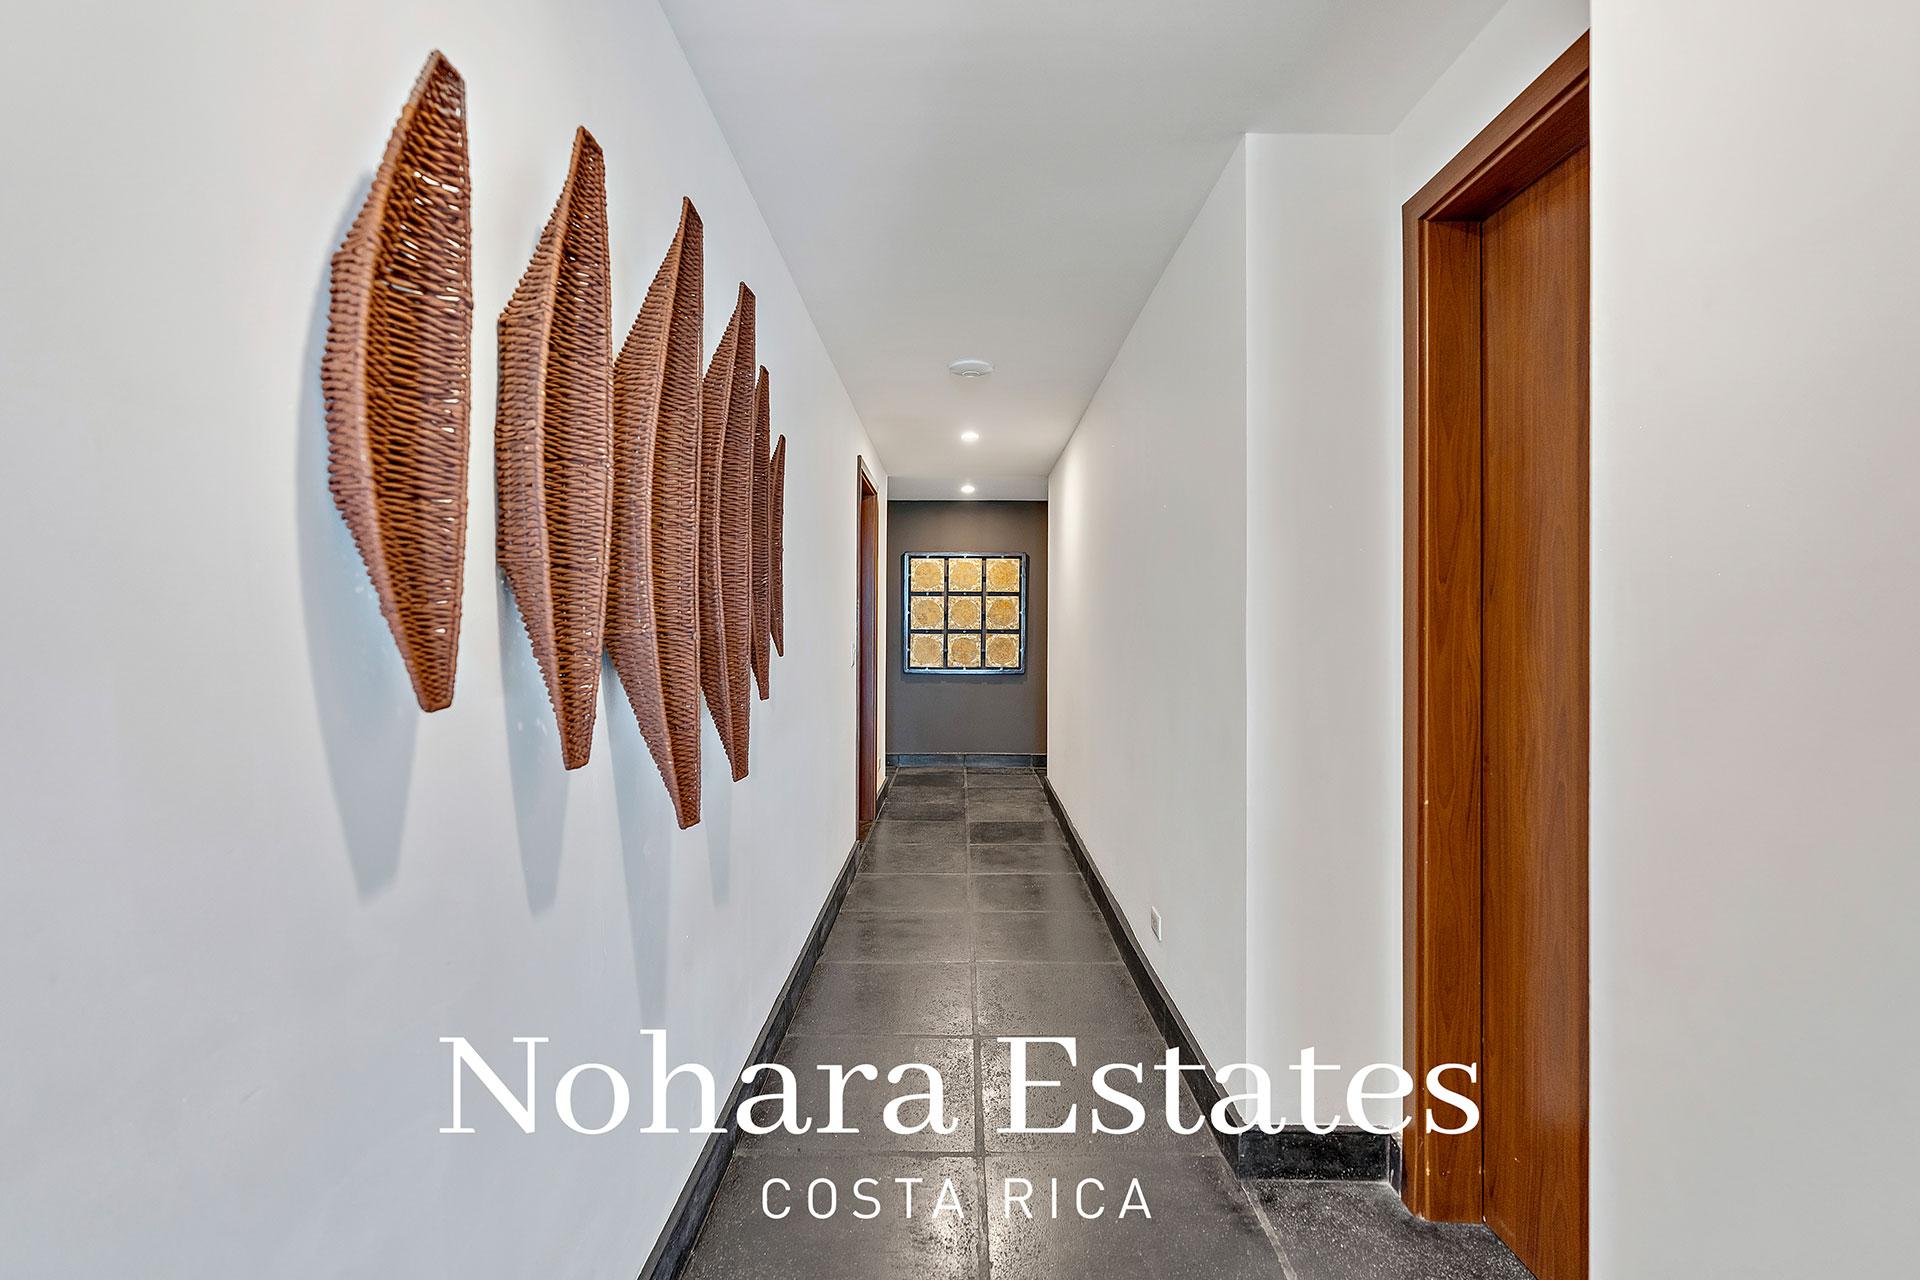 Nohara Estates Costa Rica 125 Apartment Quepos Los Altos 17